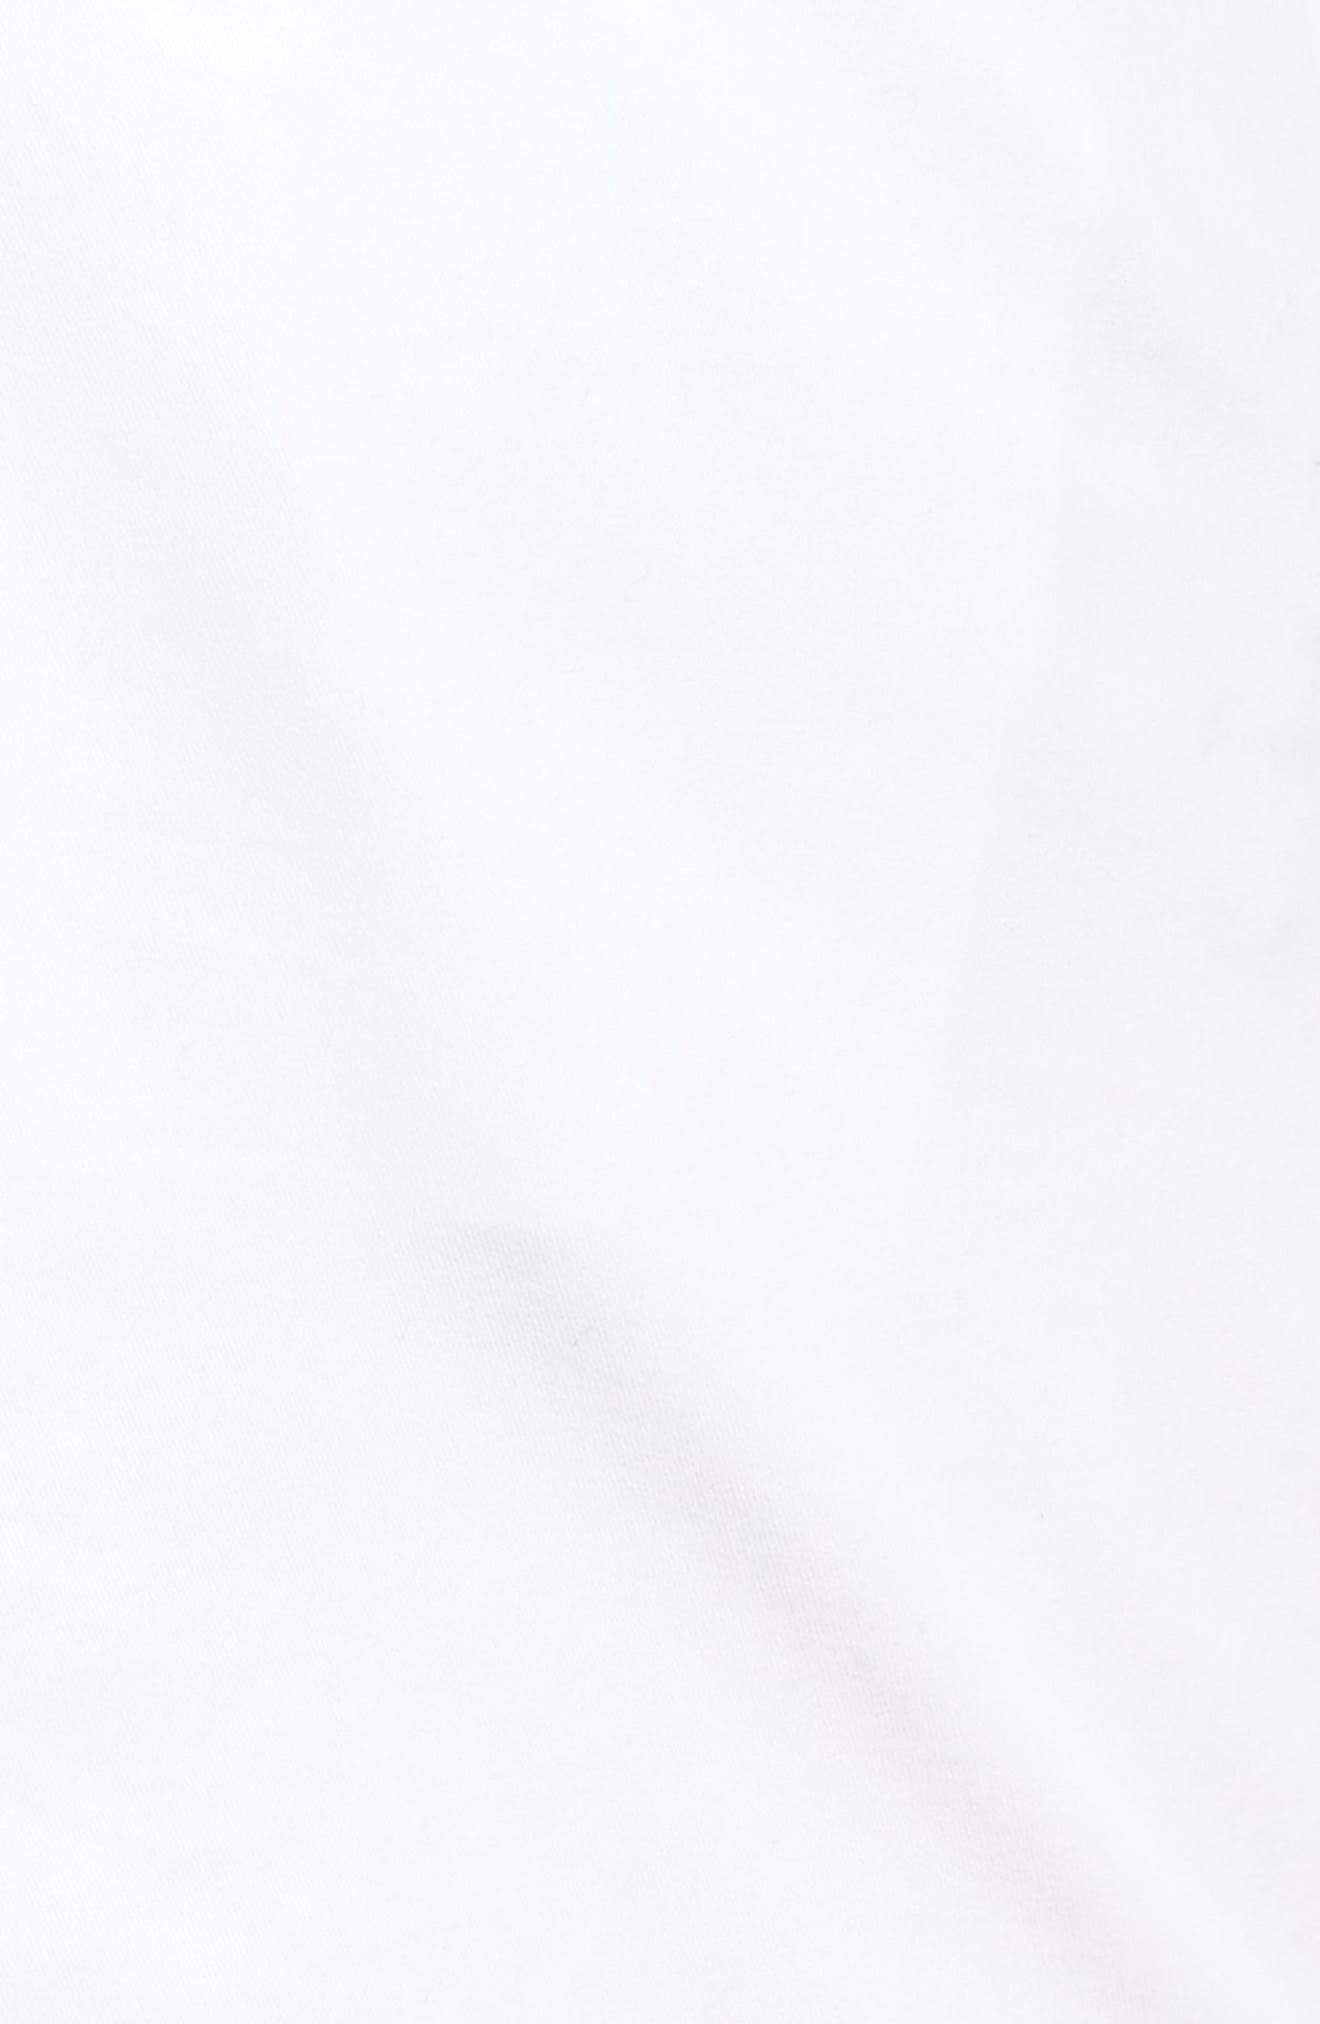 Ballard Slim Fit Stretch Chino 7-Inch Shorts,                             Alternate thumbnail 50, color,